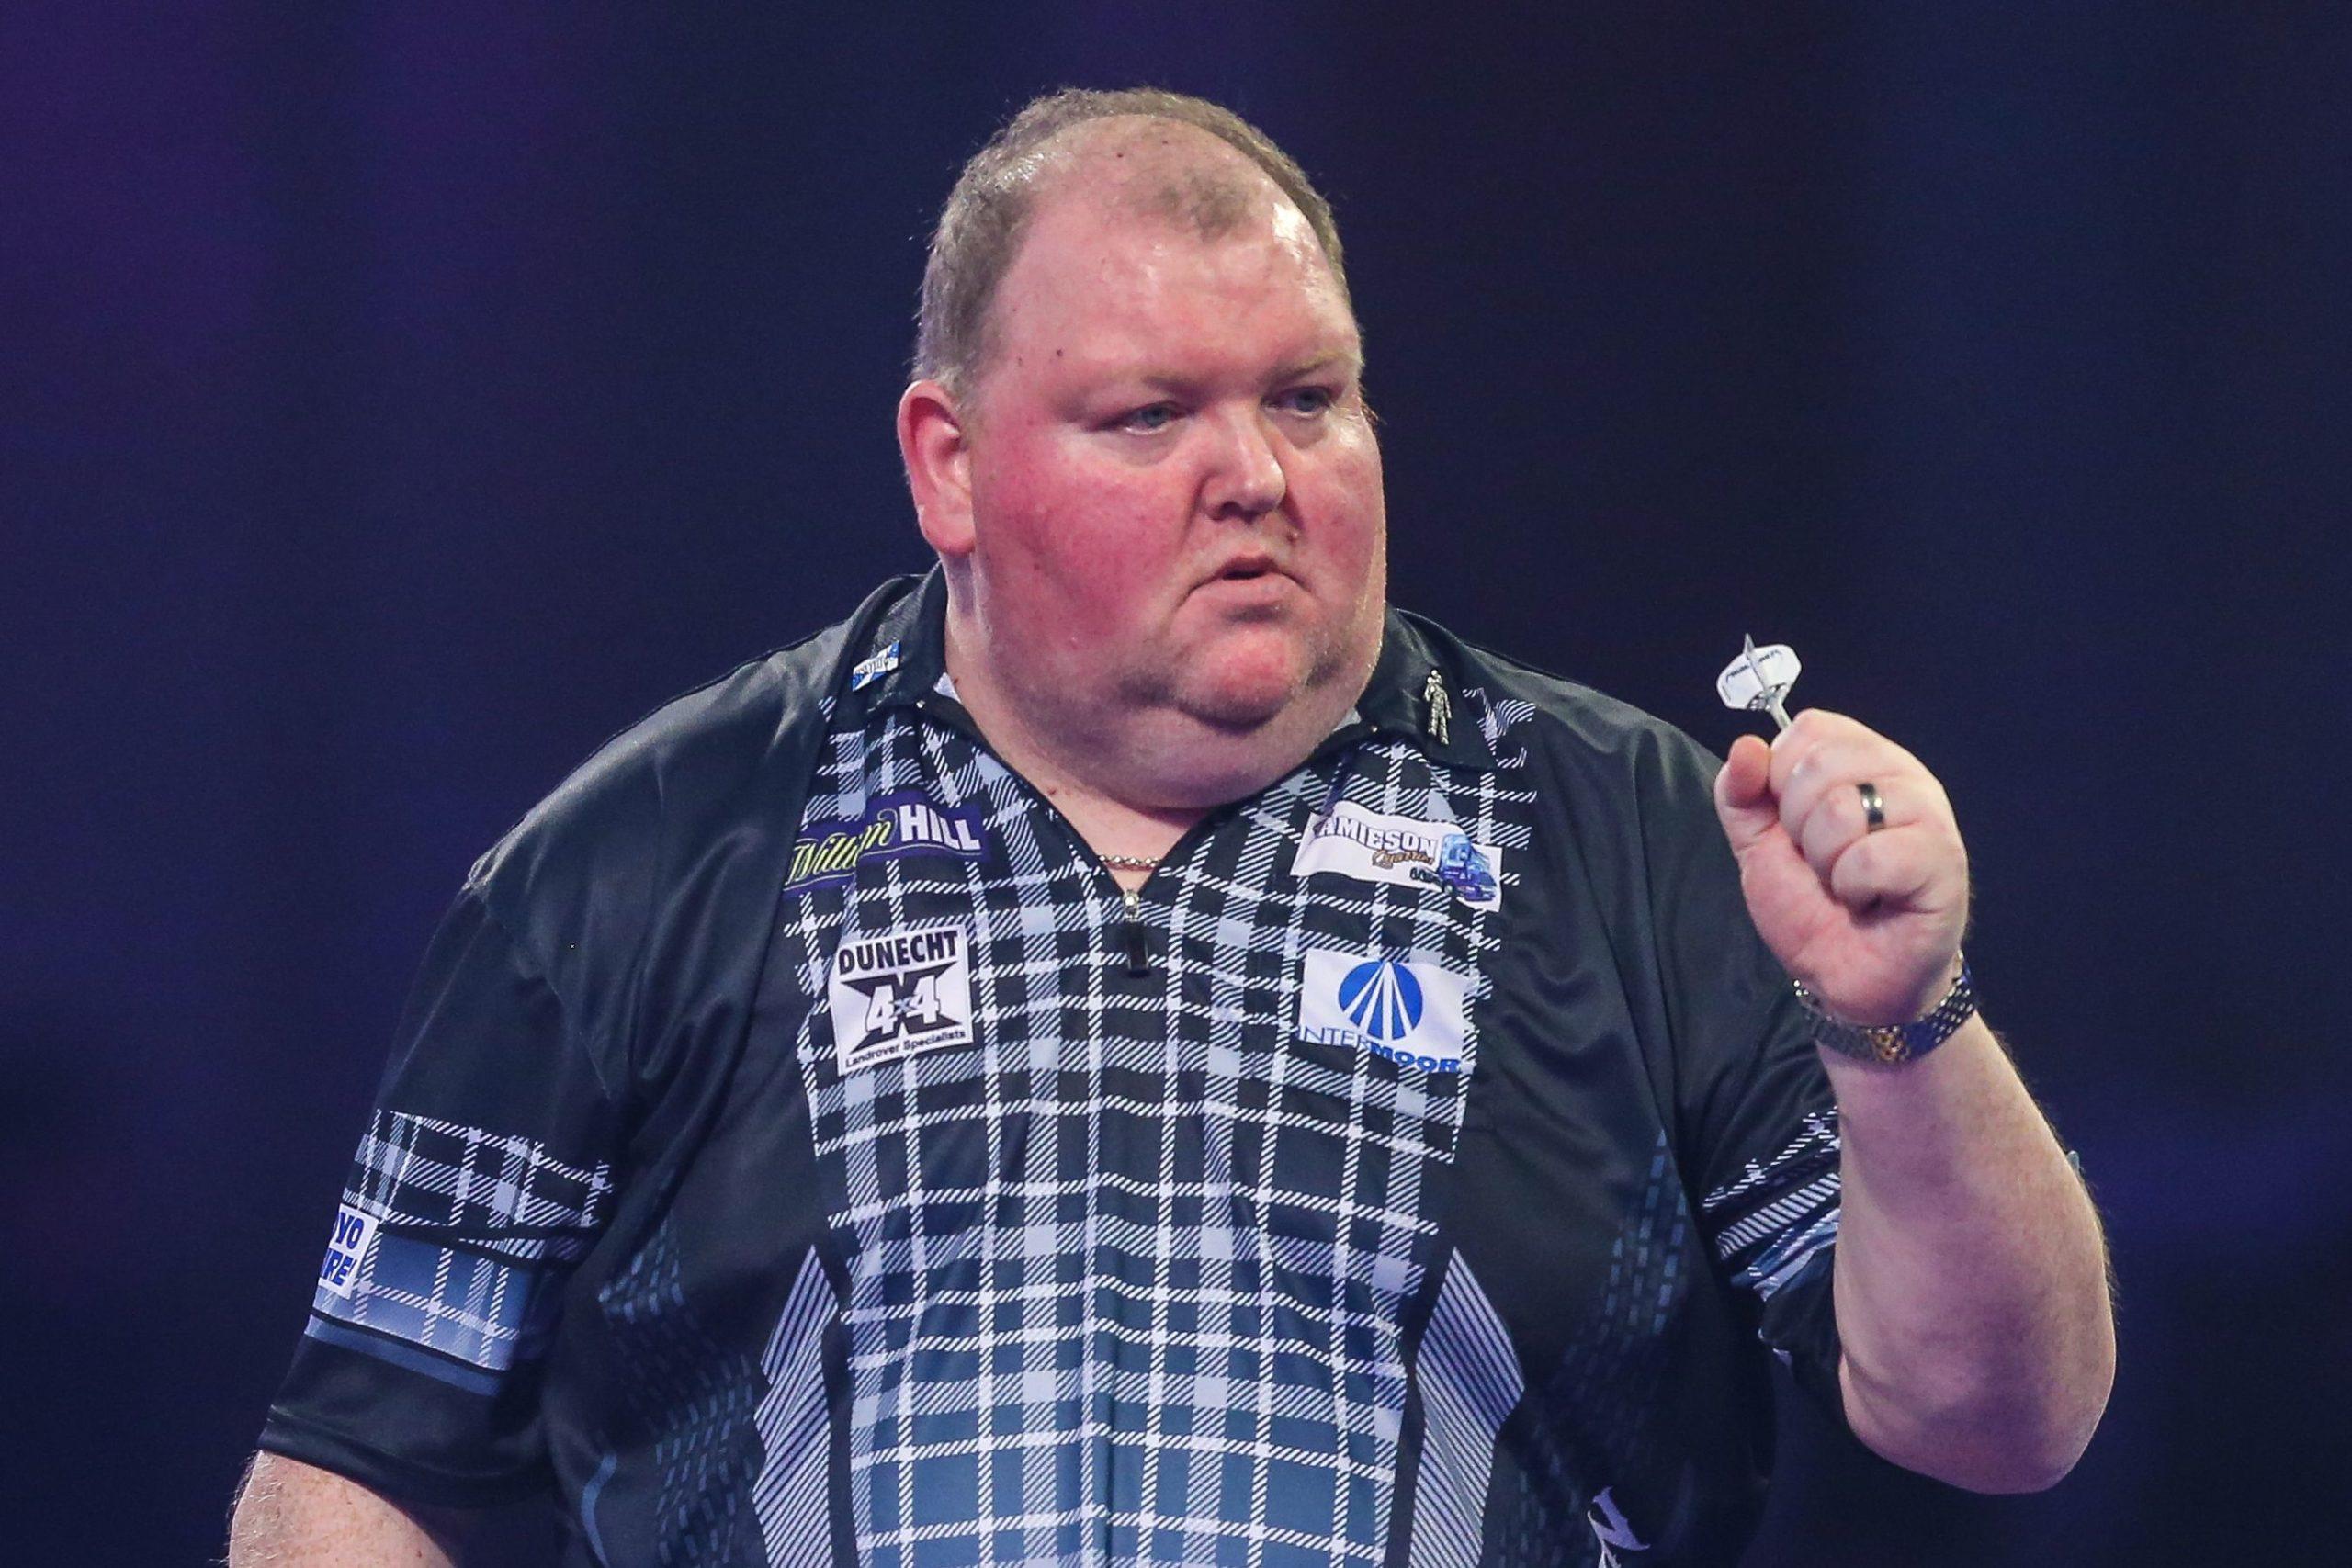 Huntly darts favourite John Henderson during the World Championship